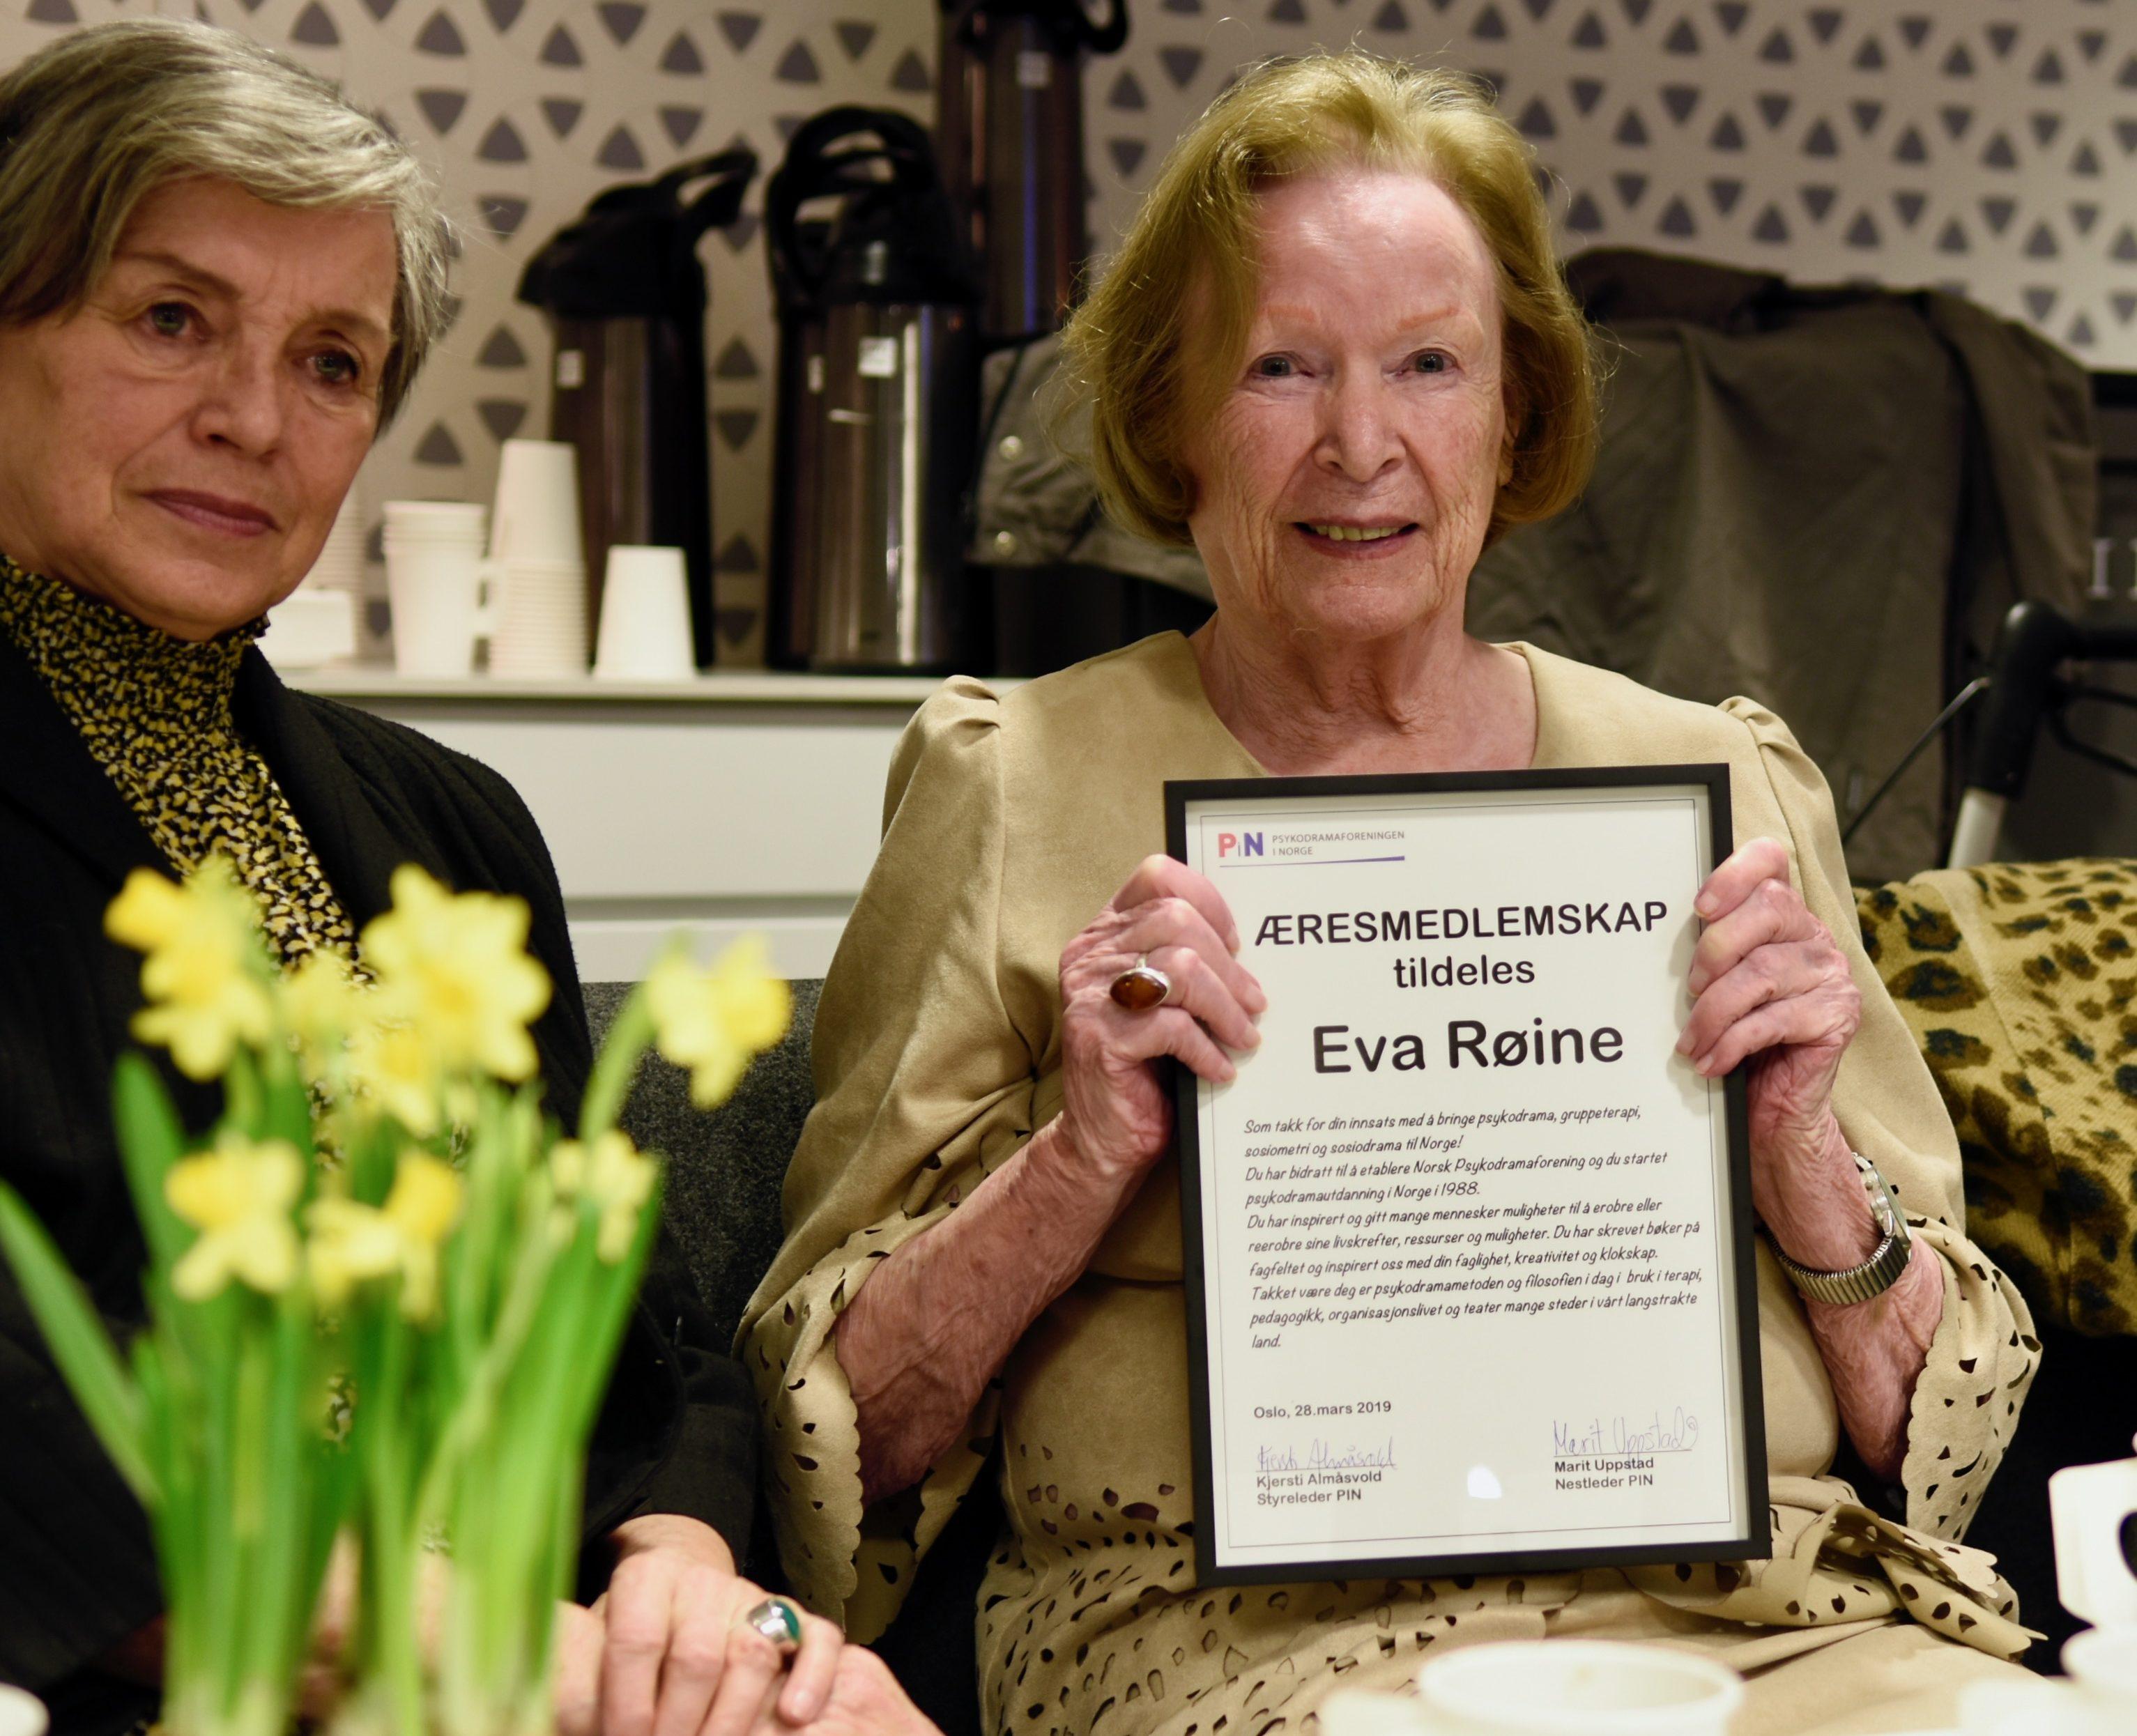 Intervju med æresmedlem Eva Røine